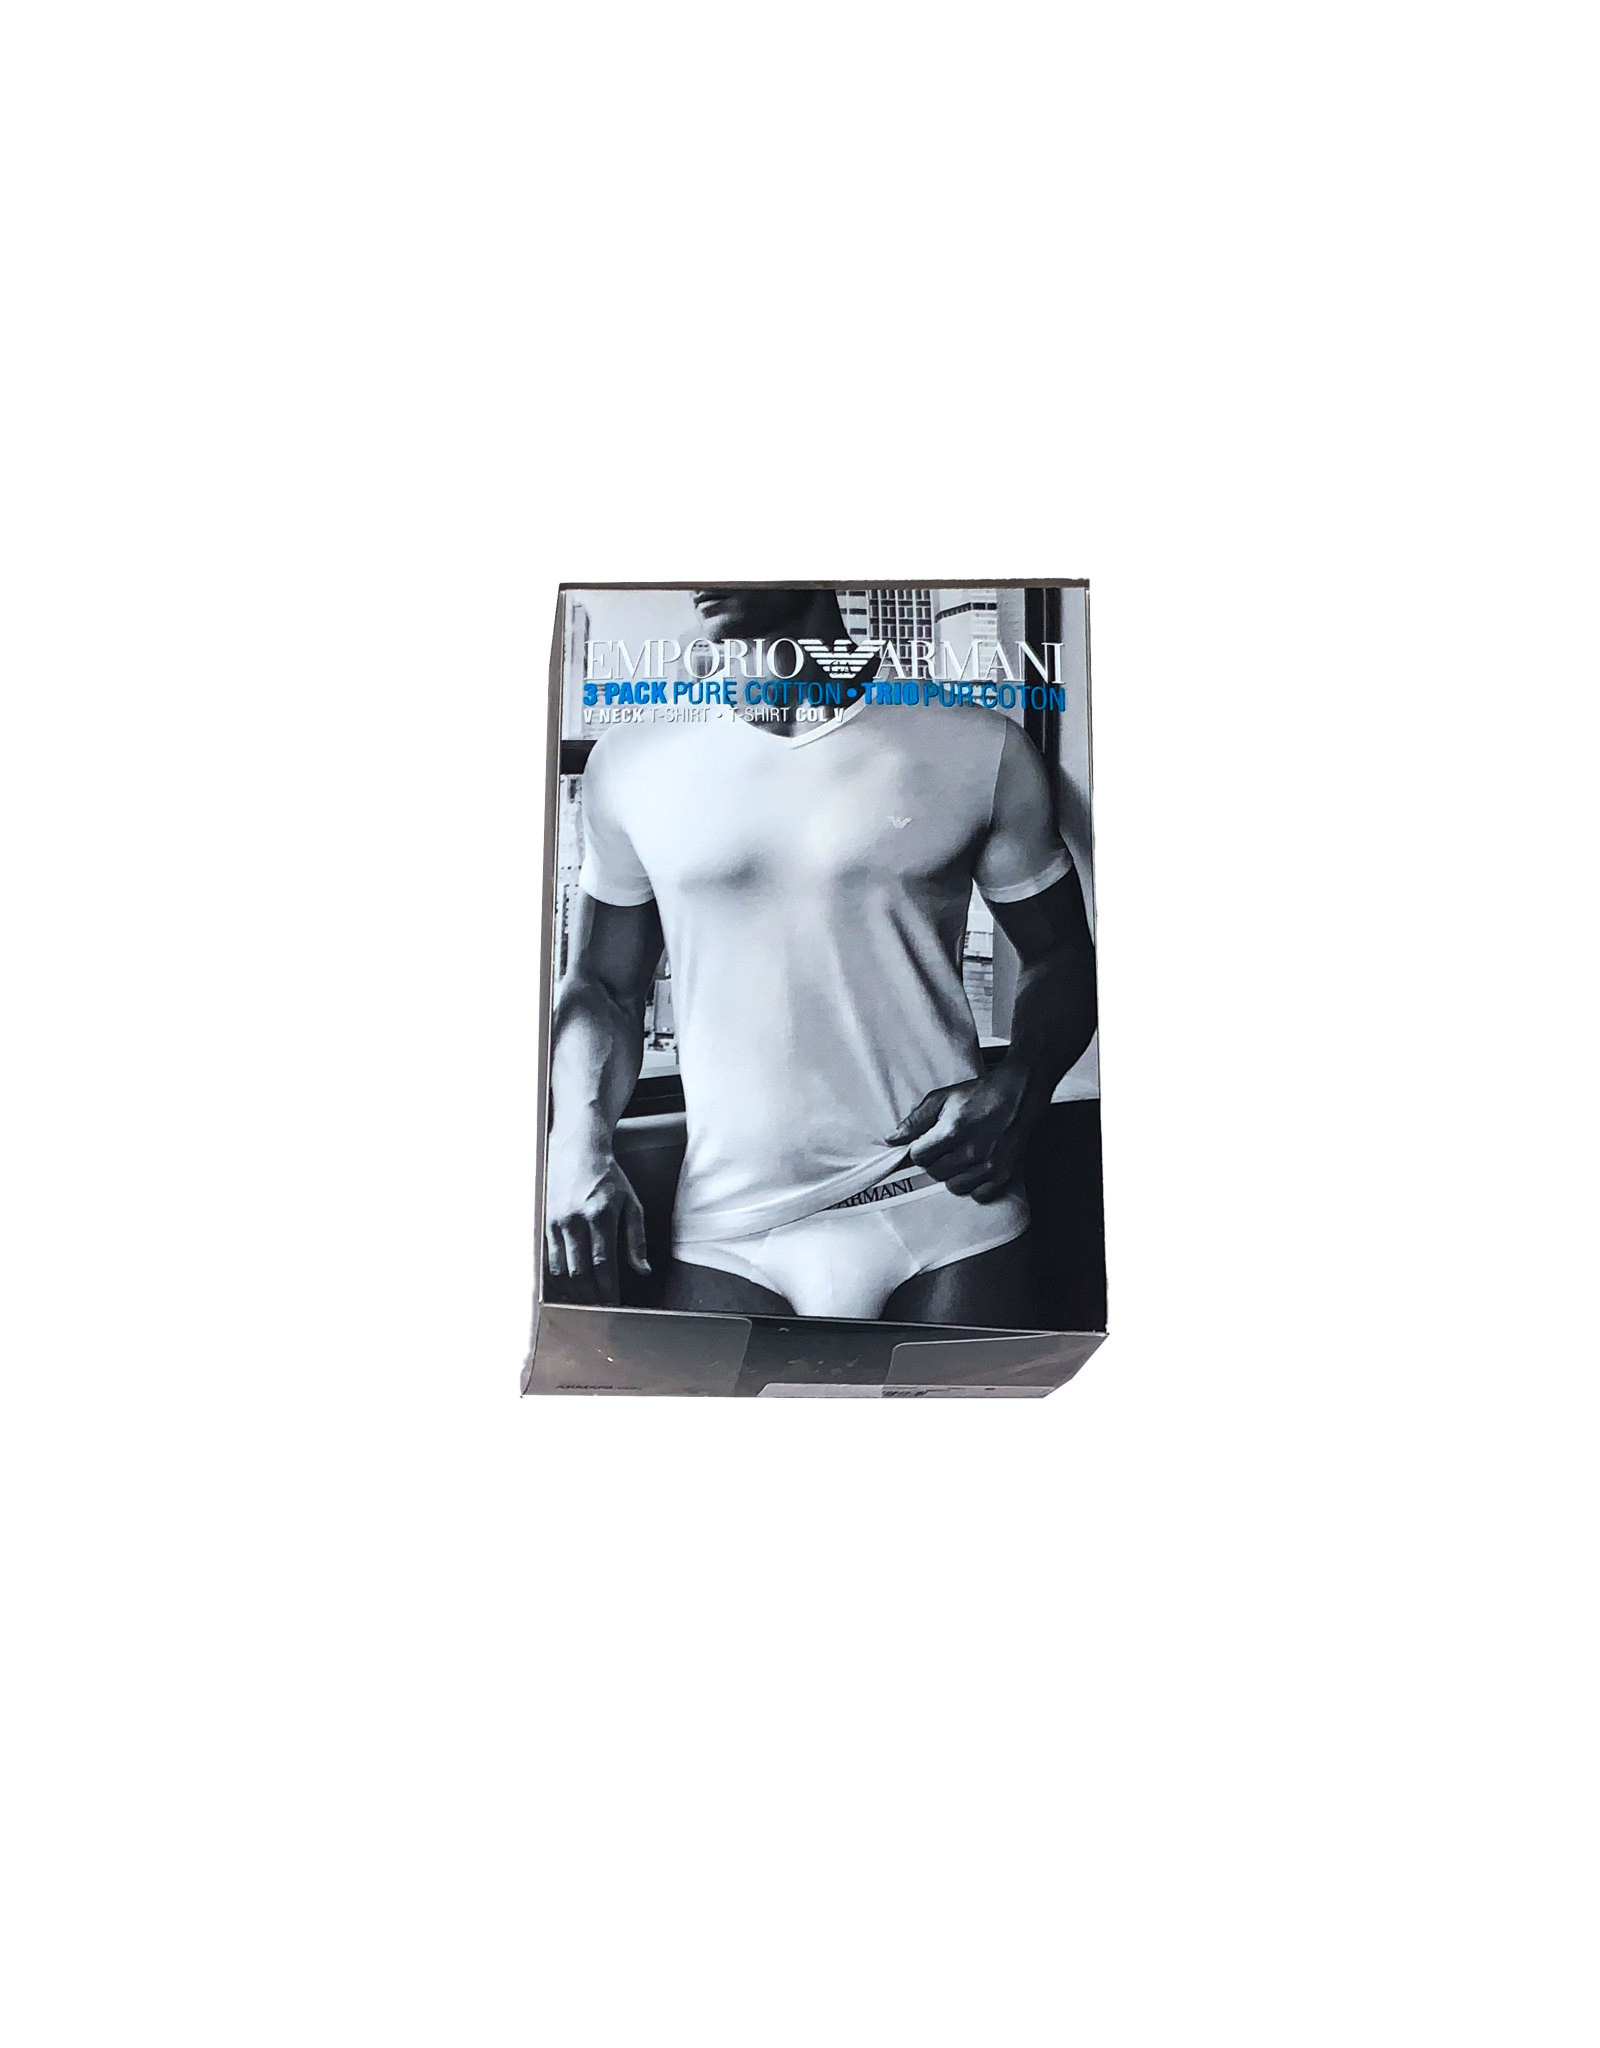 Emporio Armani EMPORIO ARMANI  3  V-neck  Tshirt  SizeM